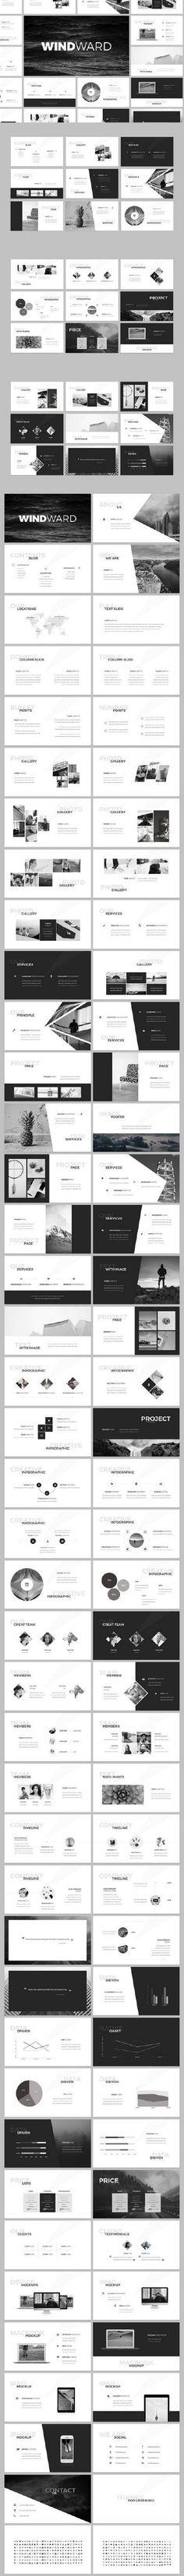 WindWard PowerPoint Template 859006